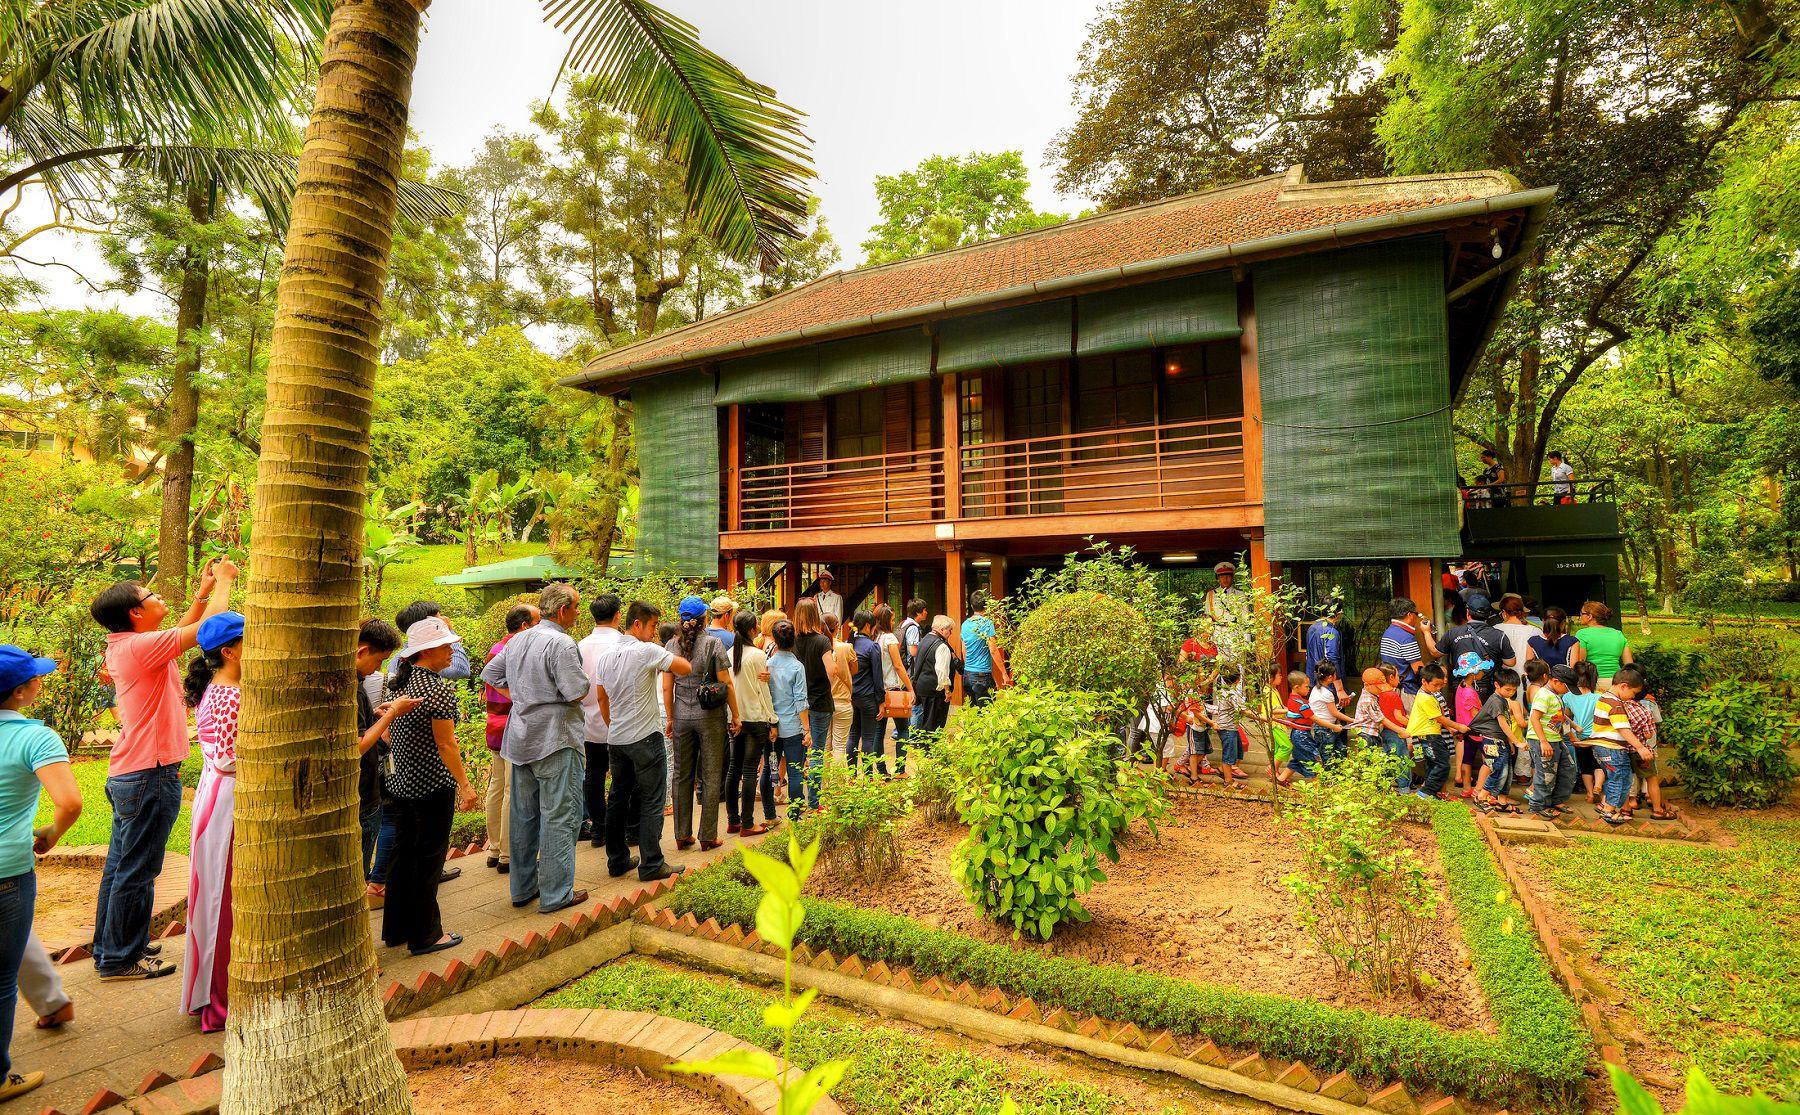 Why You Should Visit Ho Chi Minh's Stilt House in Vietnam